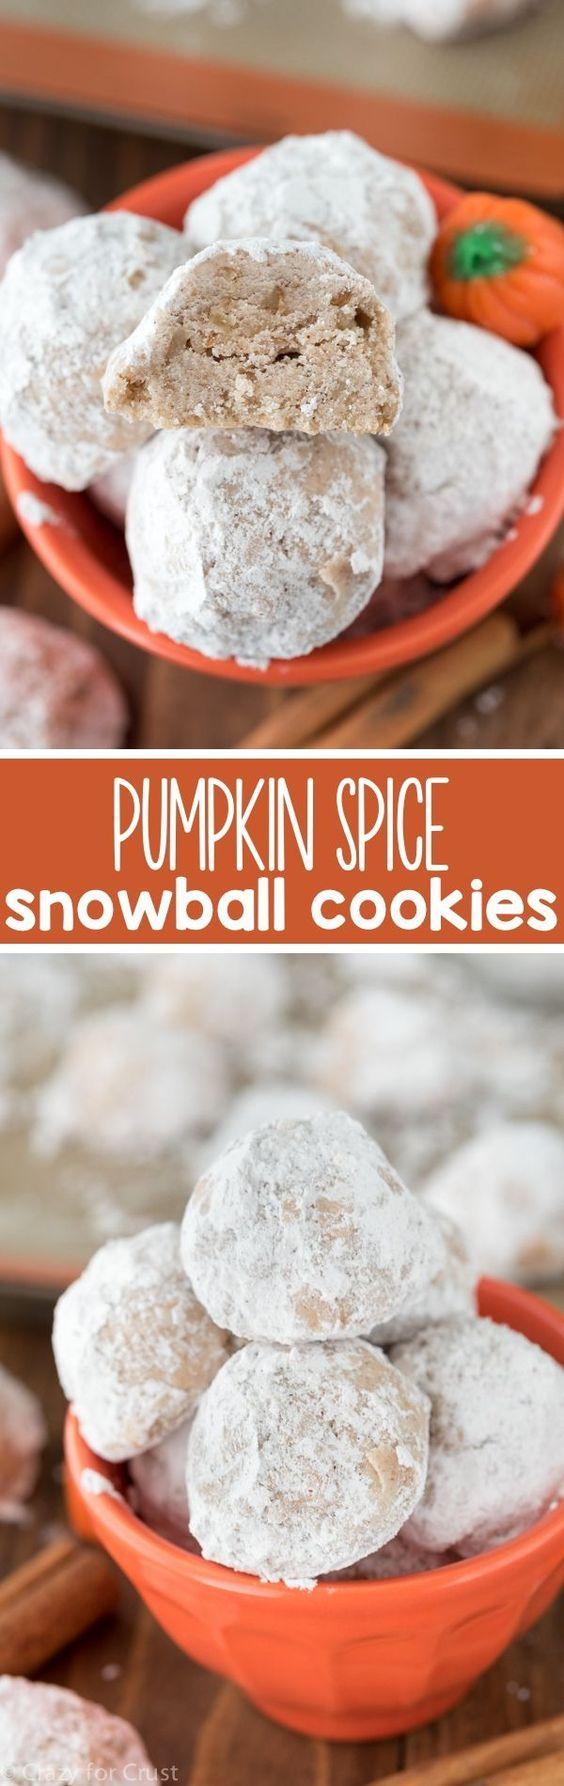 Easy Pumpkin Spice Snowball Cookies